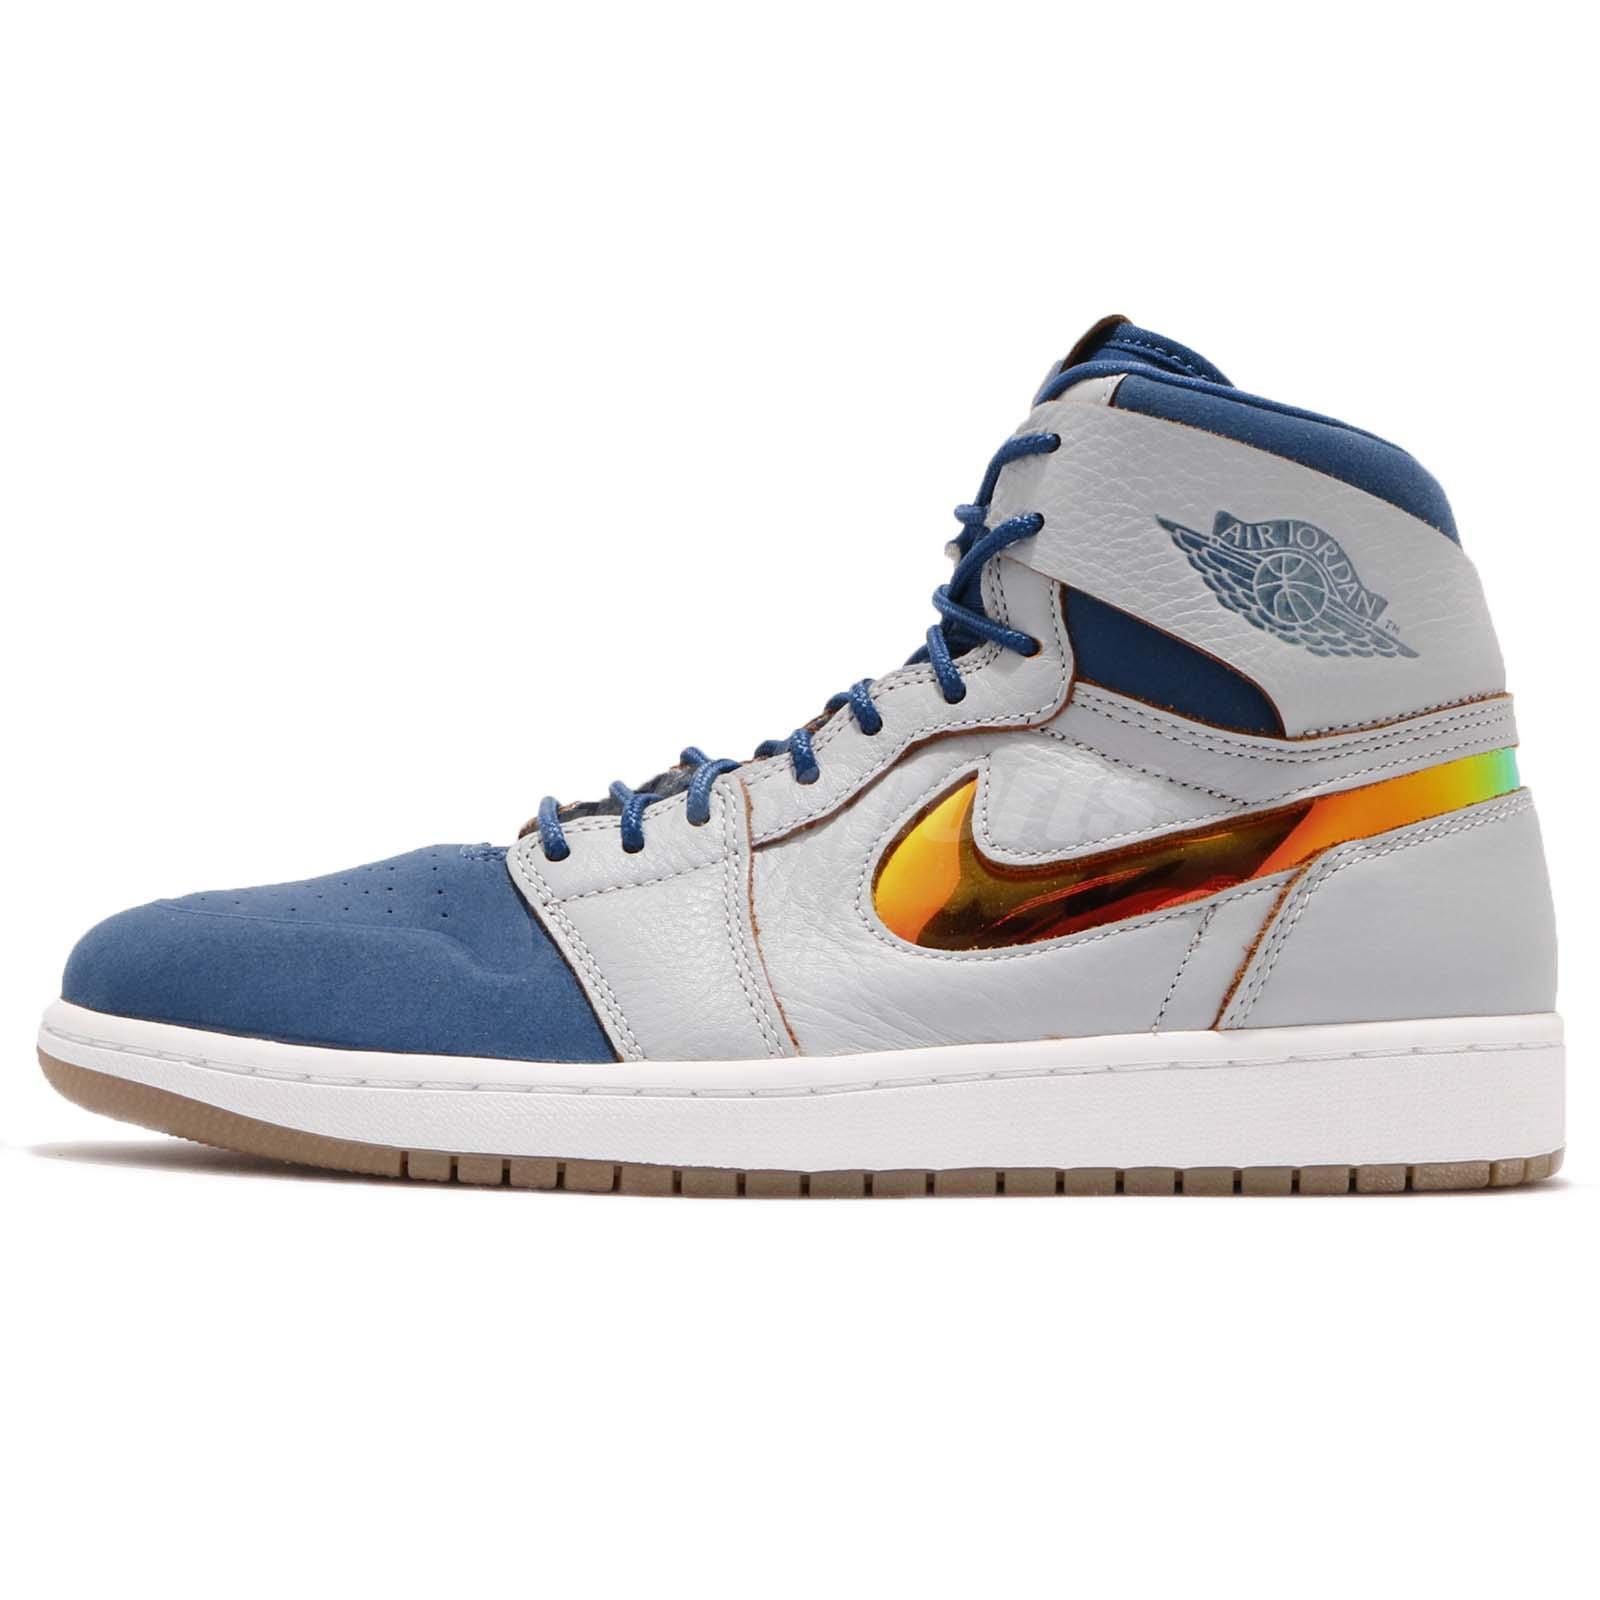 nike air jordan 1 retro high mens basketball shoes